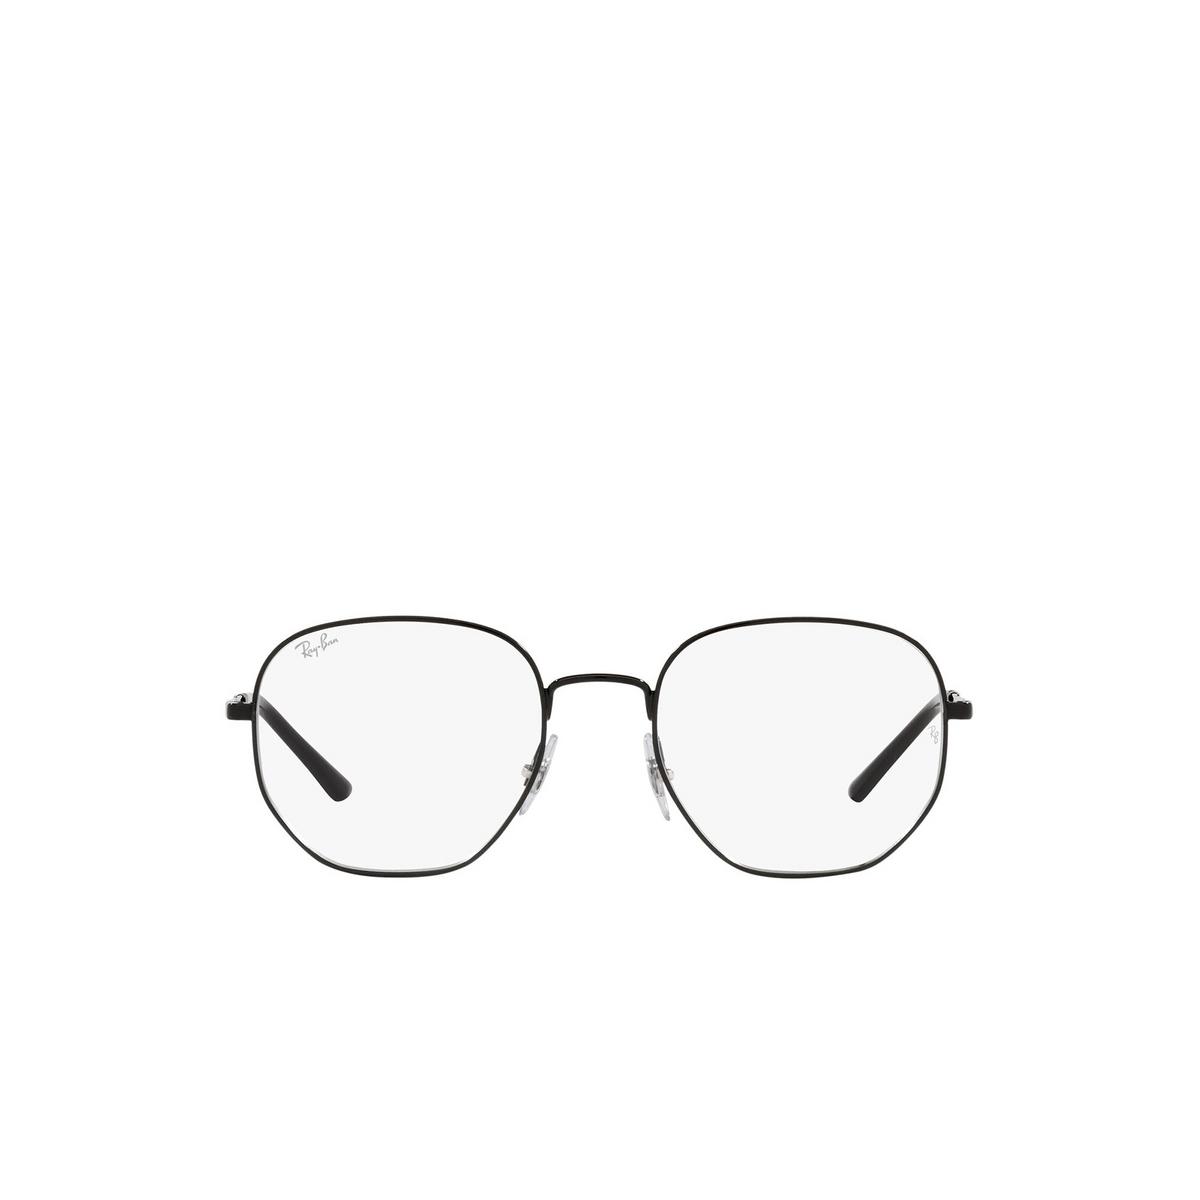 Ray-Ban® Irregular Eyeglasses: RX3682V color Black 2509 - front view.